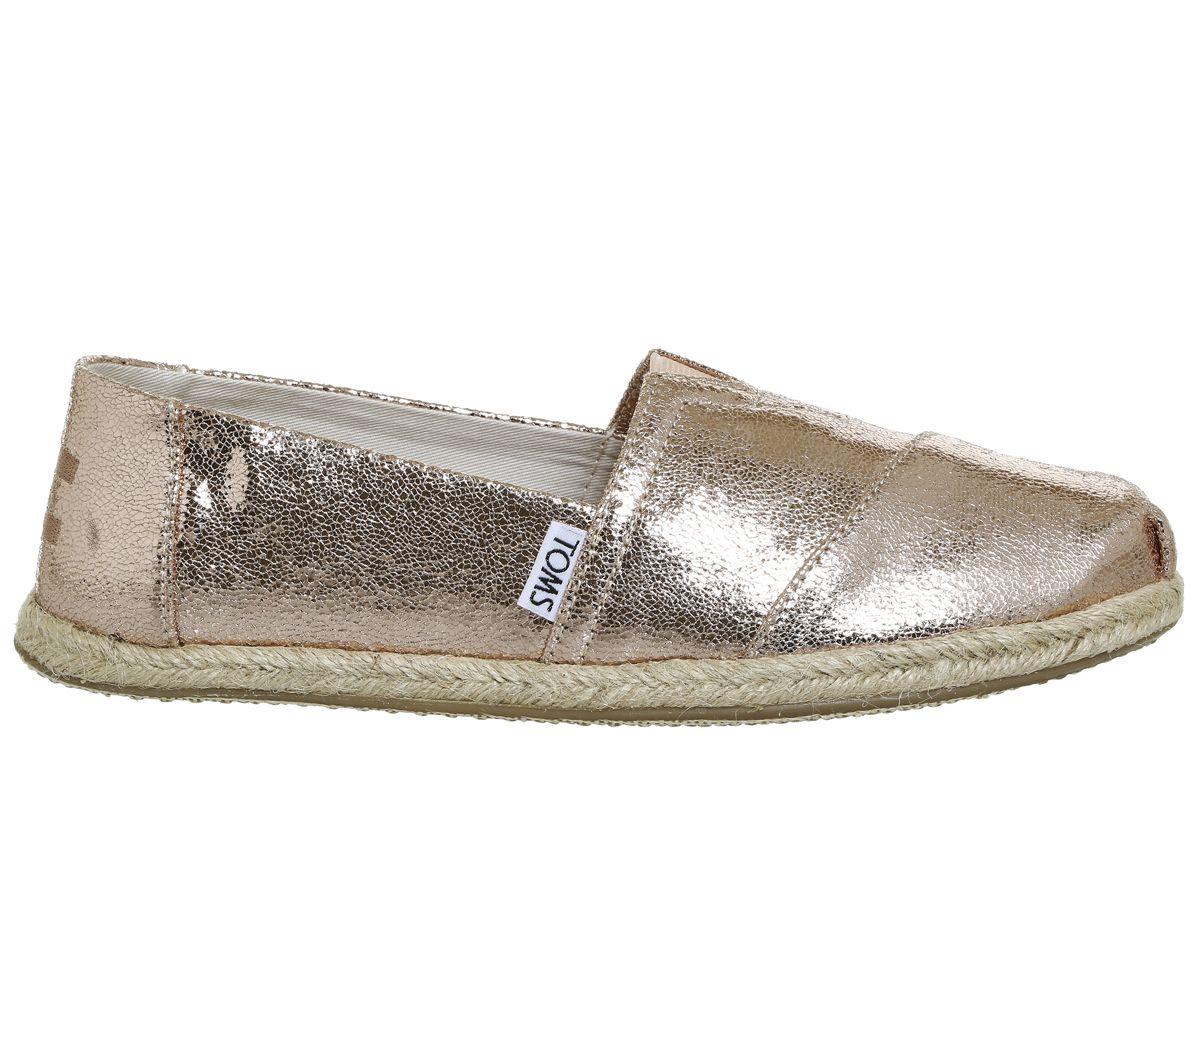 5c93232a34d Toms Seasonal Classic Slip On Rose Gold Metallic Exclusive - Flats